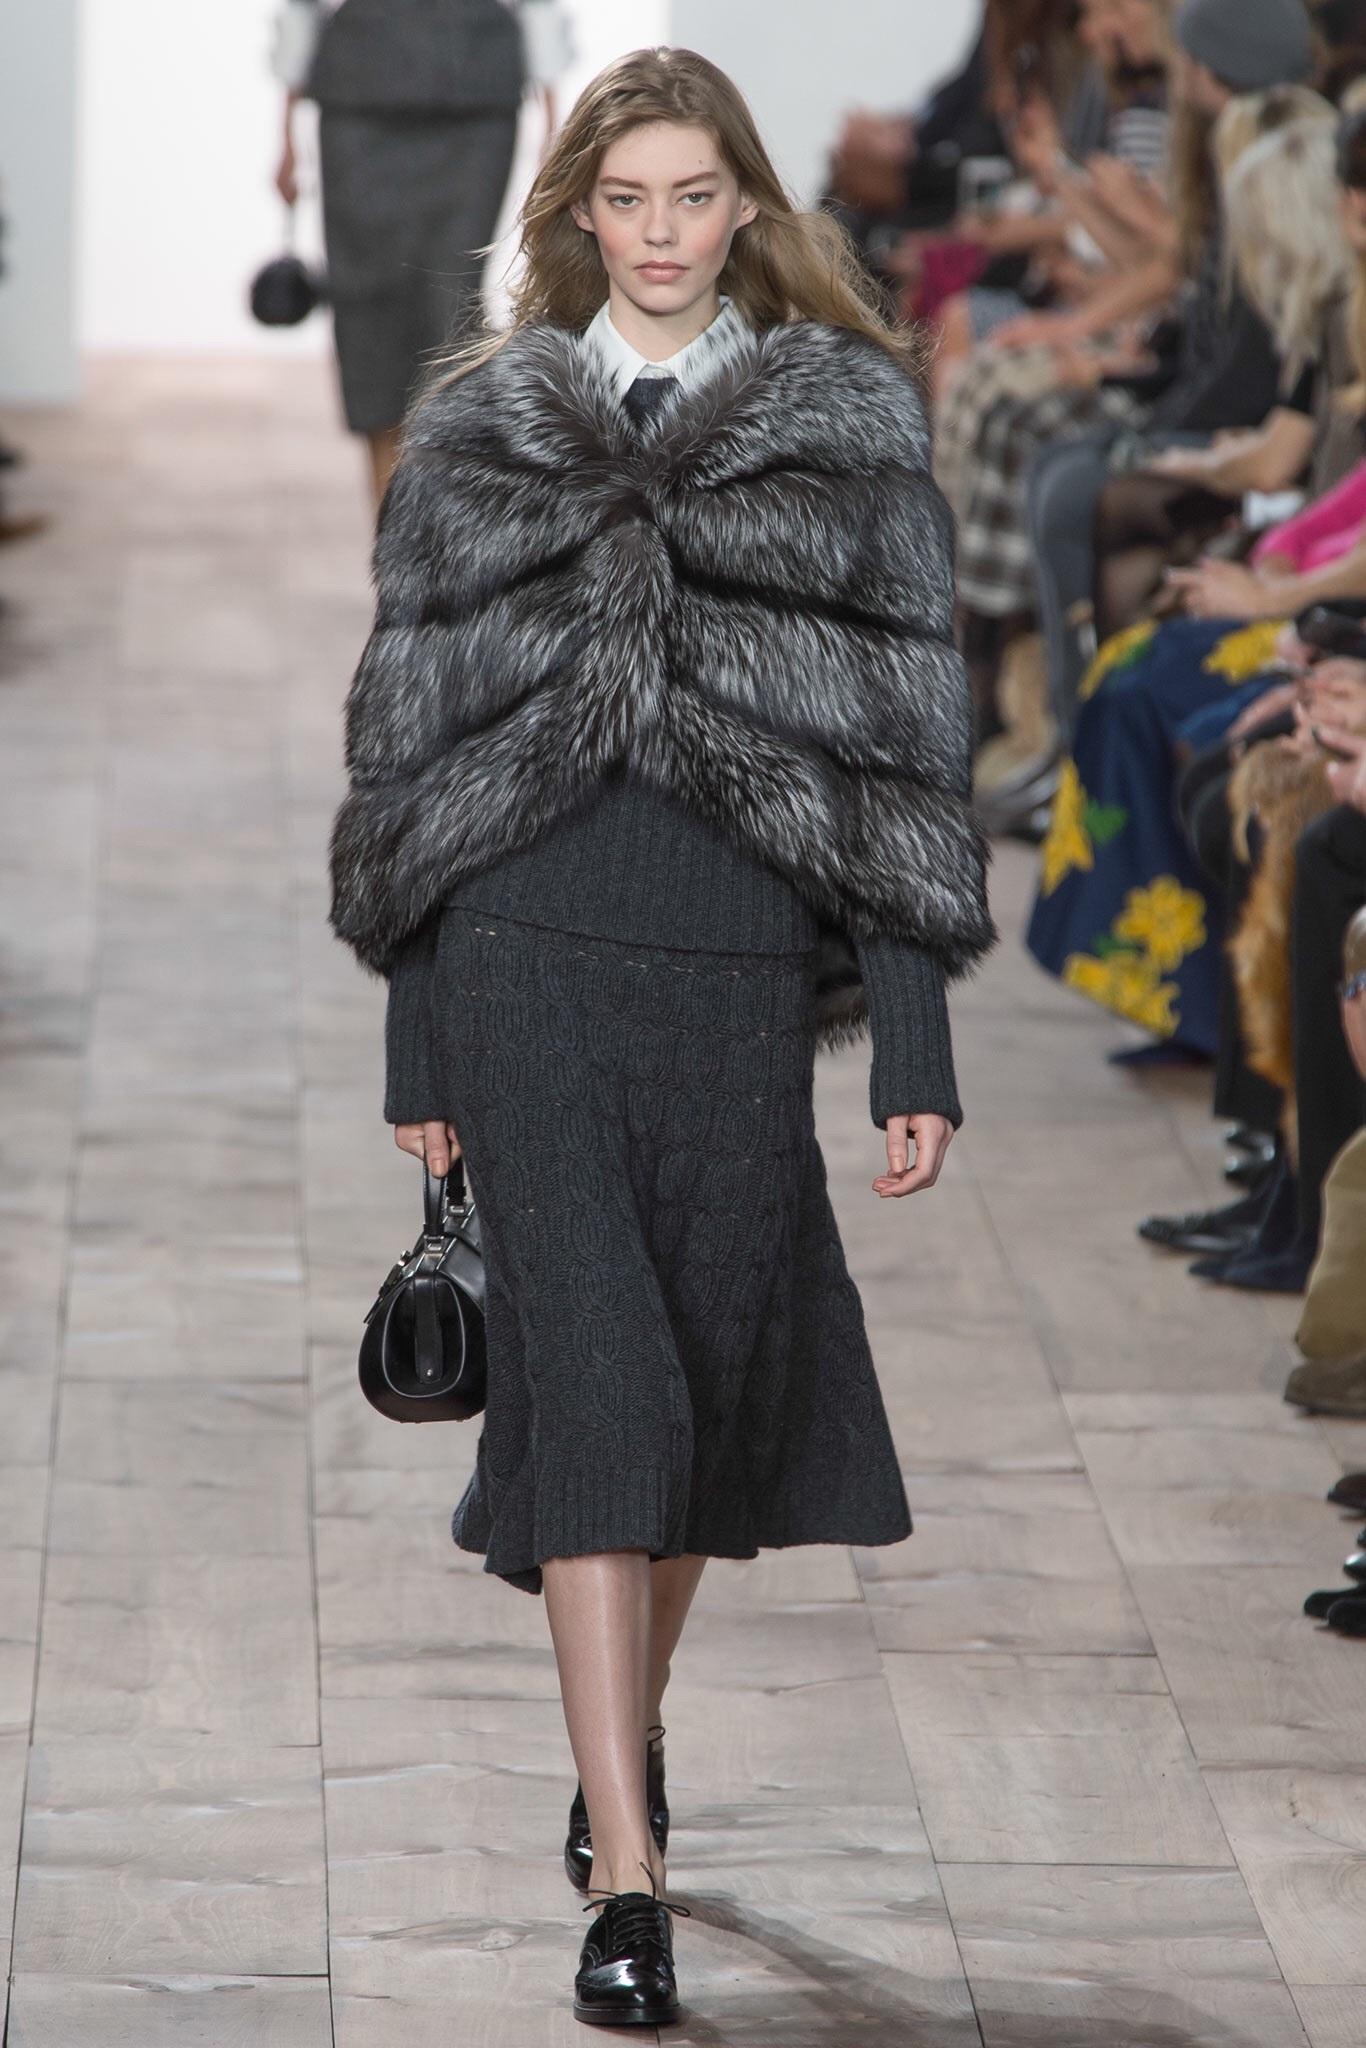 New York Fashion Week 2015.jpg